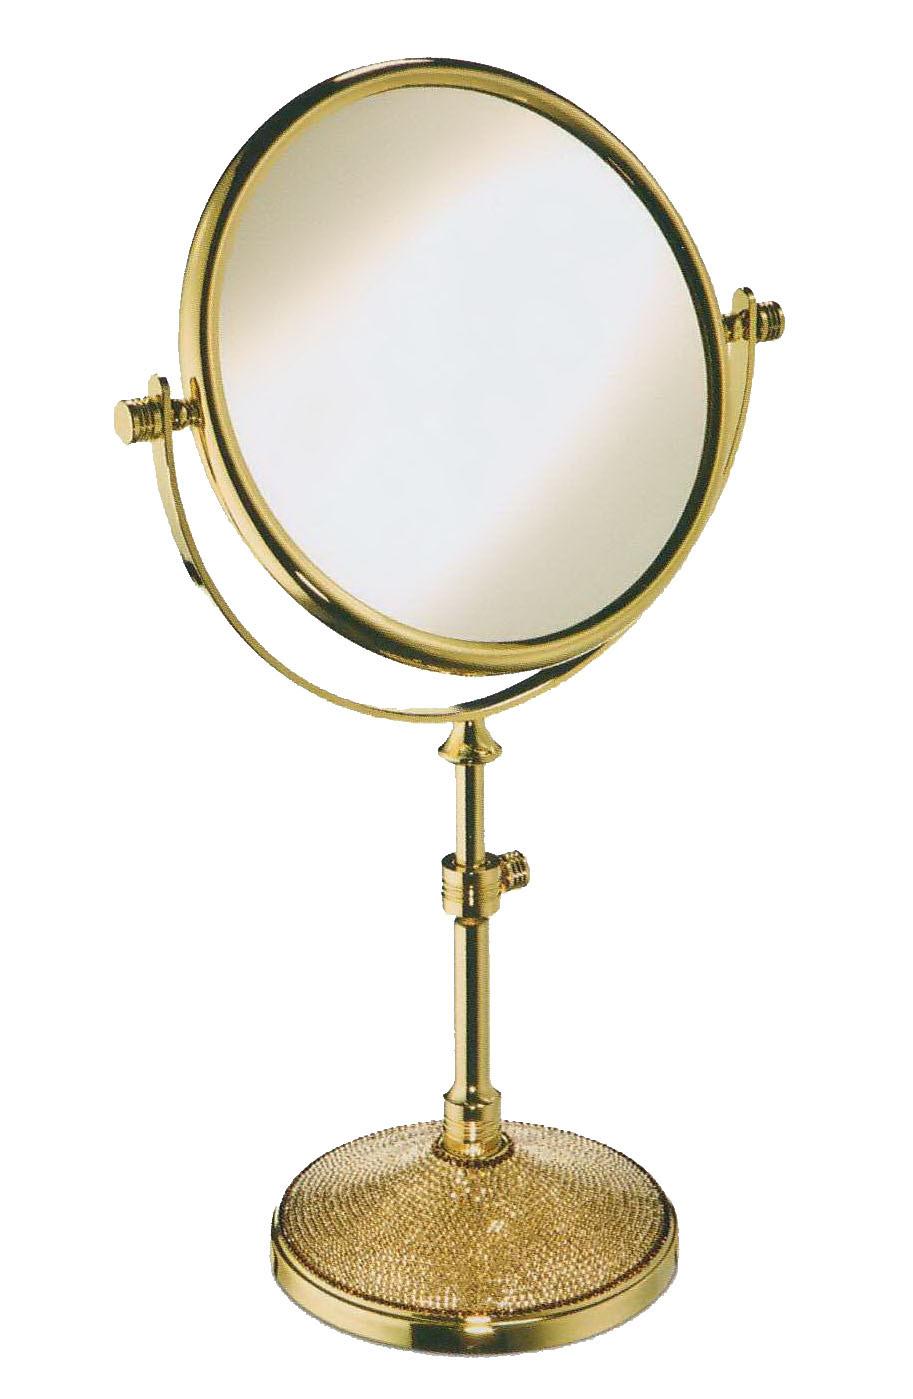 Зеркала Элитное зеркало косметическое 99532O 7XOP Starlight от Windisch elitnoe-zerkalo-kosmeticheskoe-99532o-3x-starlight-ot-windisch-ispaniya.jpg